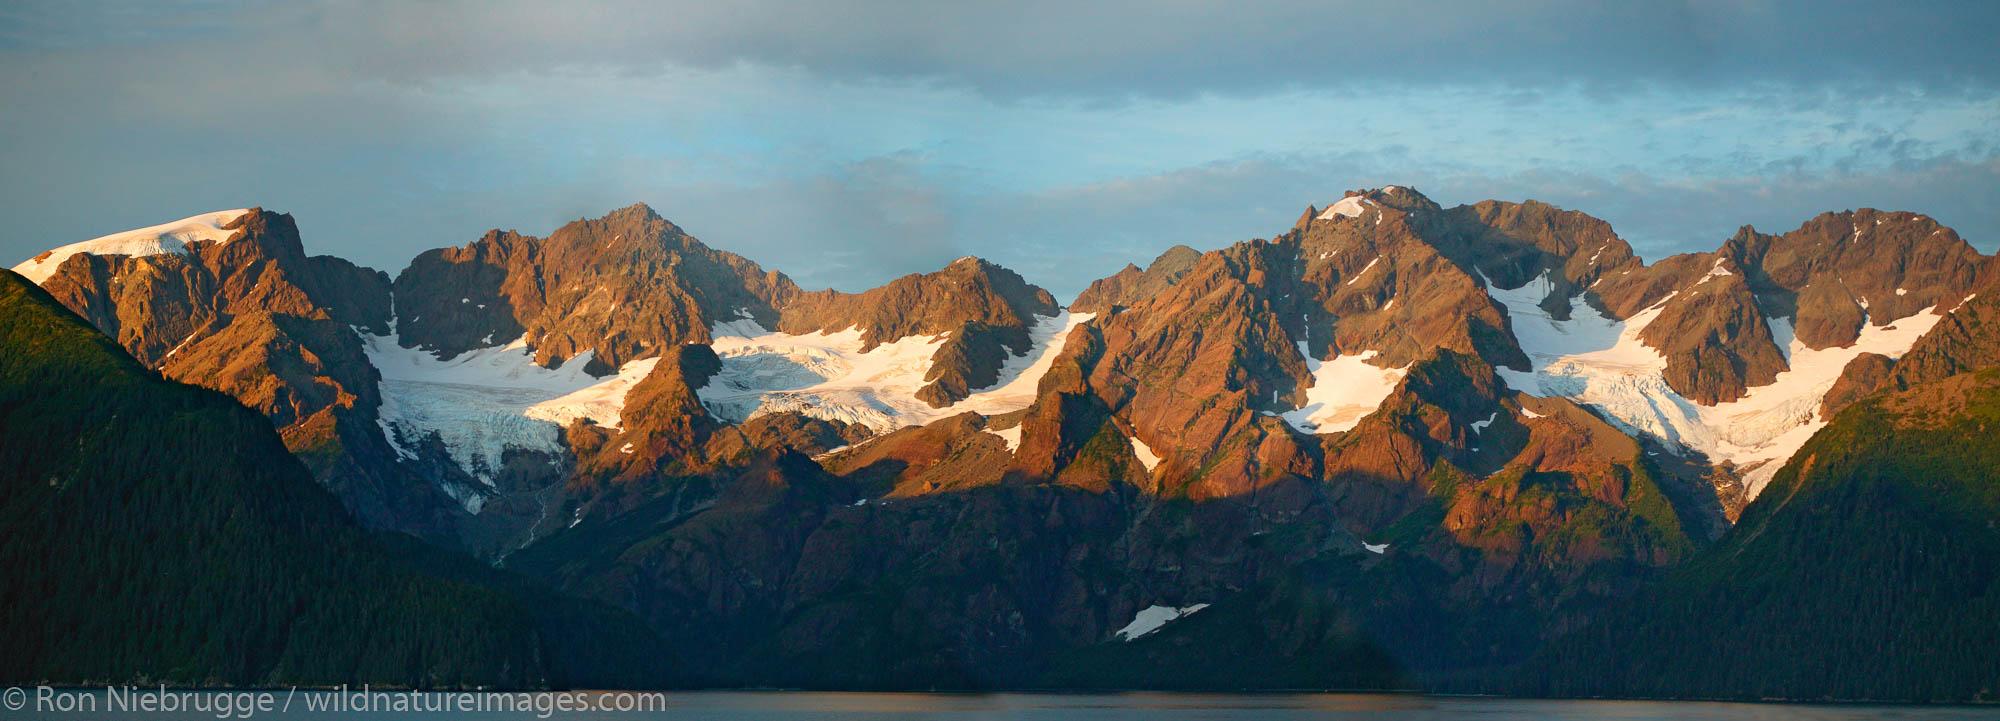 A panoramic photo of Thumbs Cove Resurrection Bay Chugach National Forest Alaska.